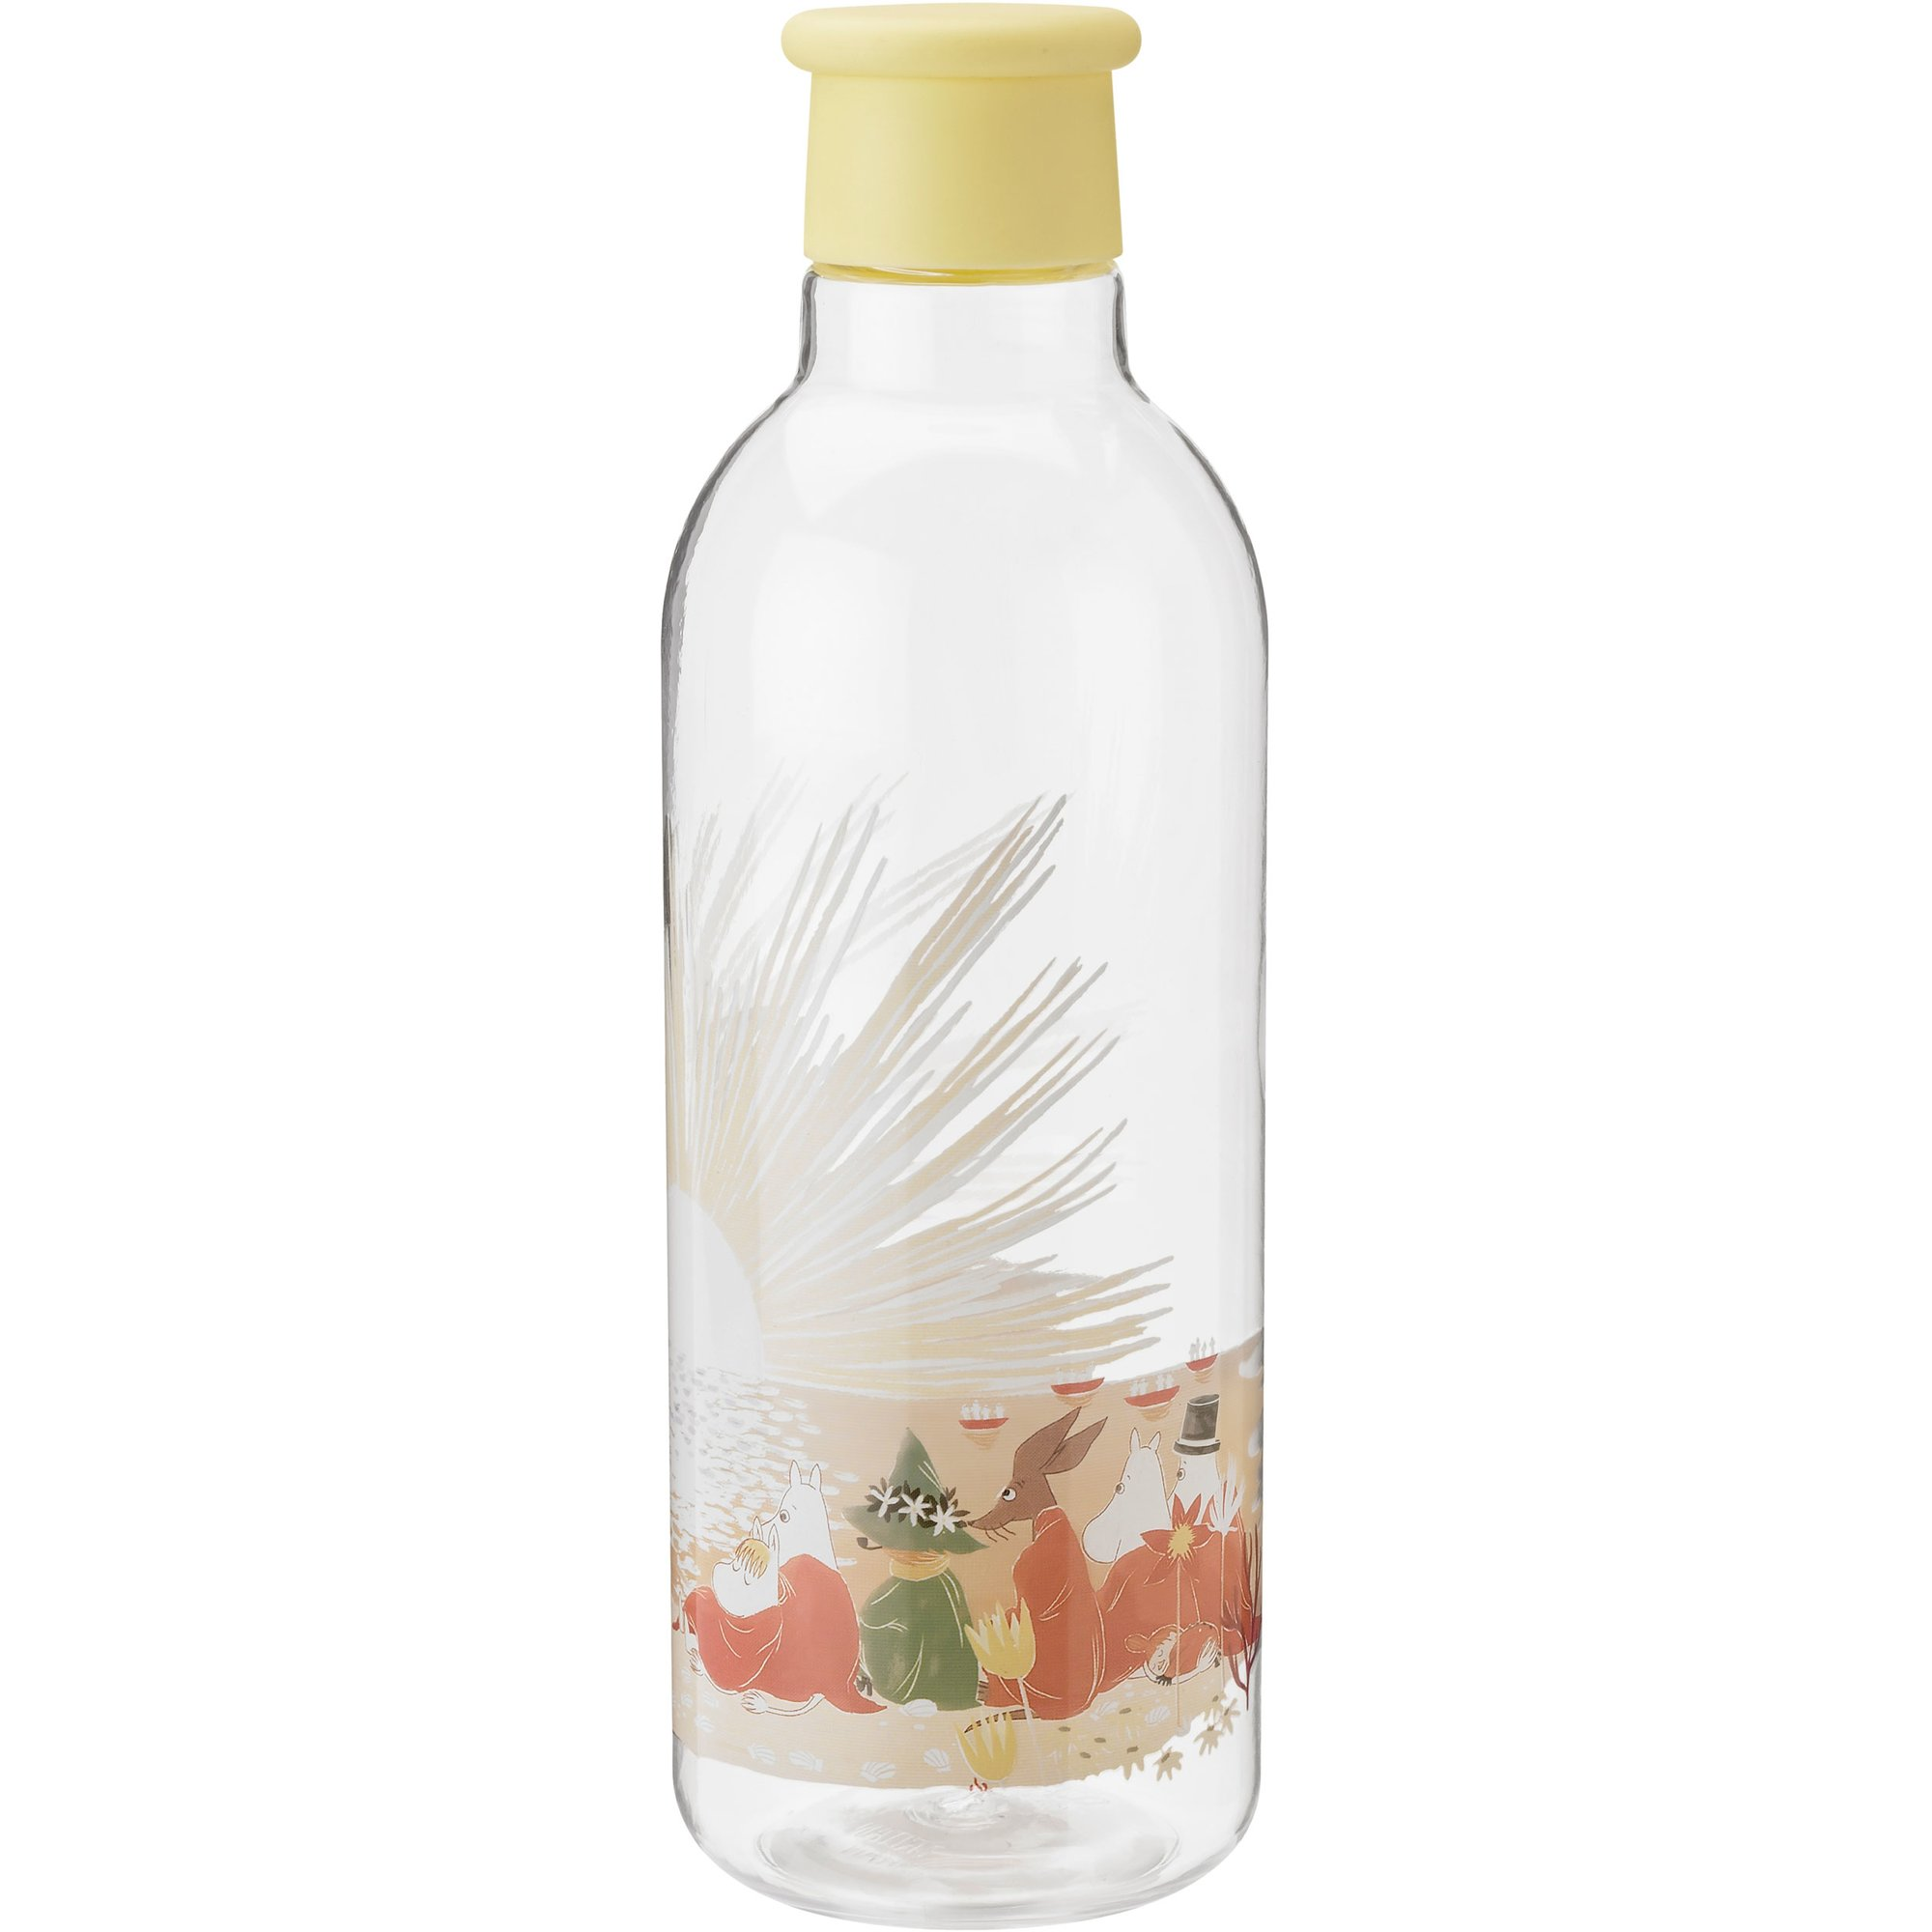 RIG-TIG DRINK-IT Mumintroll vattenflaska Gul